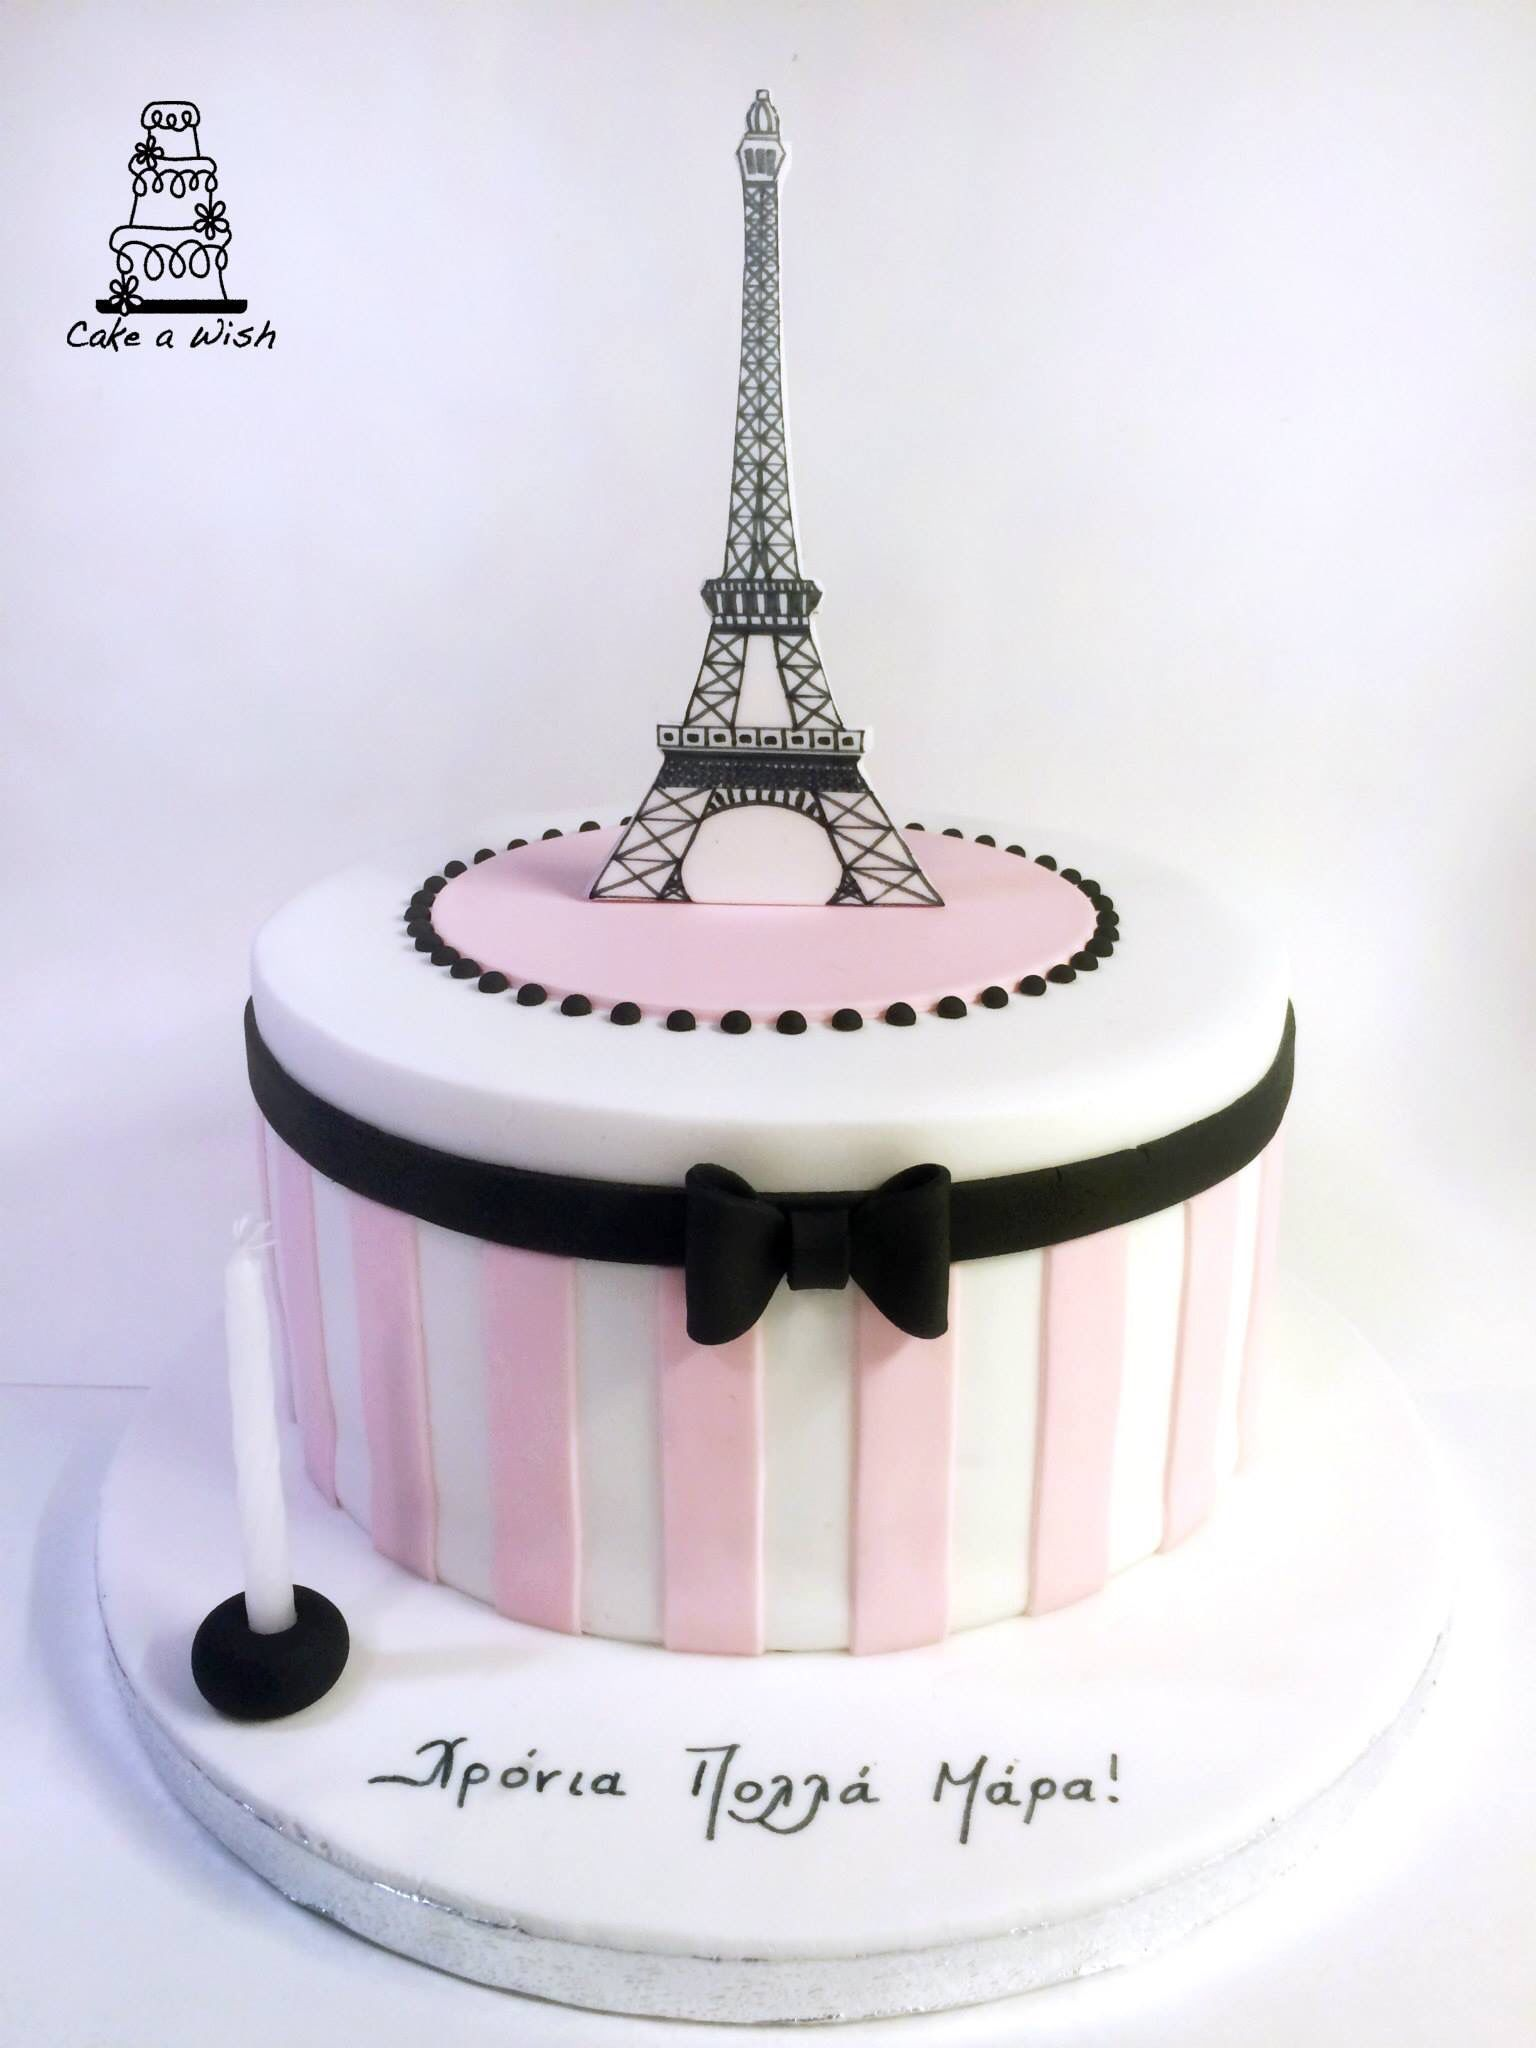 Astonishing Eiffel Tower With Images Paris Birthday Cakes Paris Cakes Funny Birthday Cards Online Alyptdamsfinfo